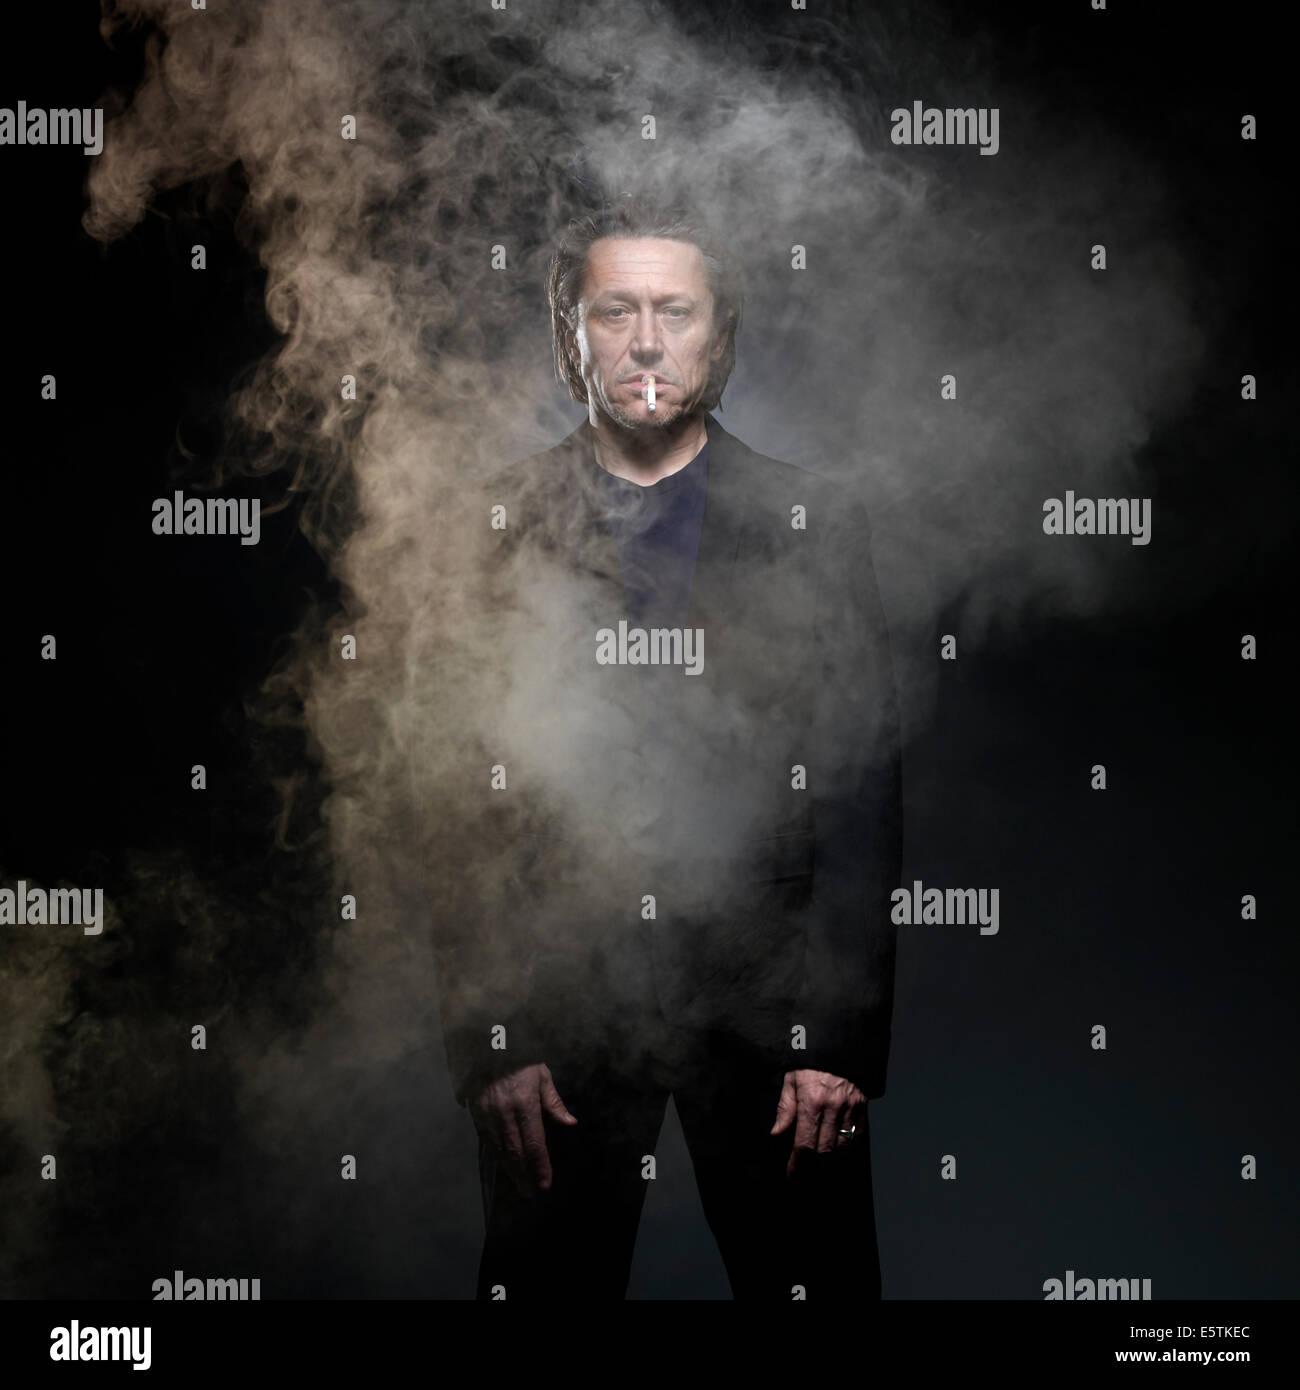 Robert Crampton who is a cigarette smoker studio shot wear black suit - Stock Image